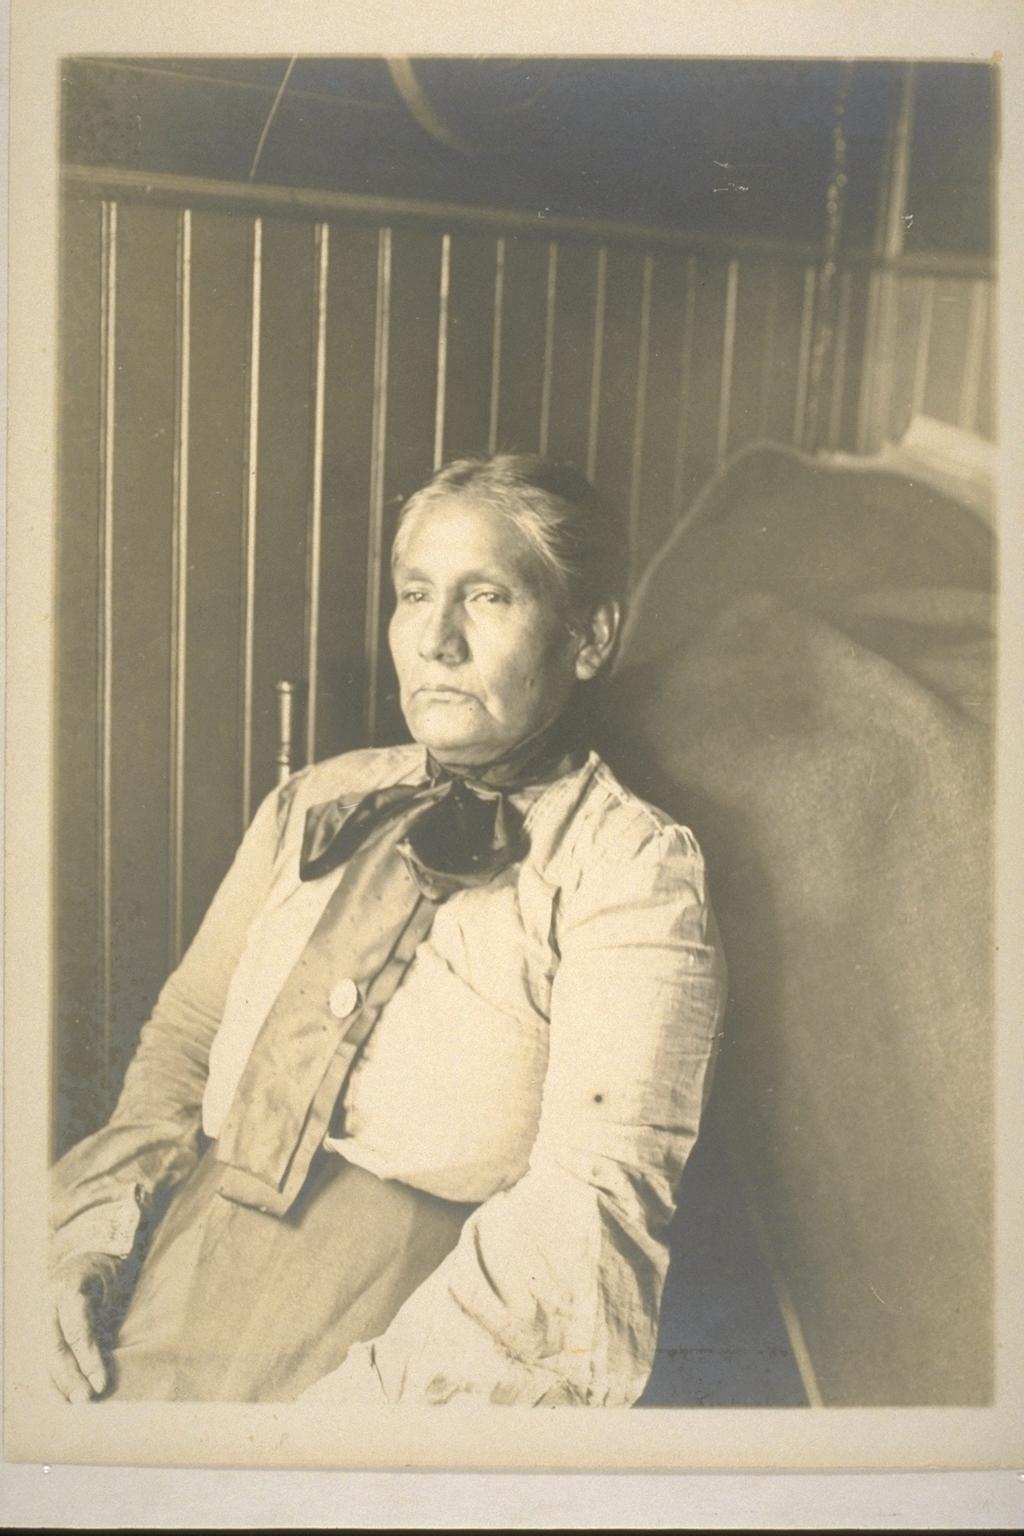 A Tongva woman named Mrs. James V. Rosemeyre, Bakersfield, July 1905. Image courtesy UC Berkeley, Bancroft Library